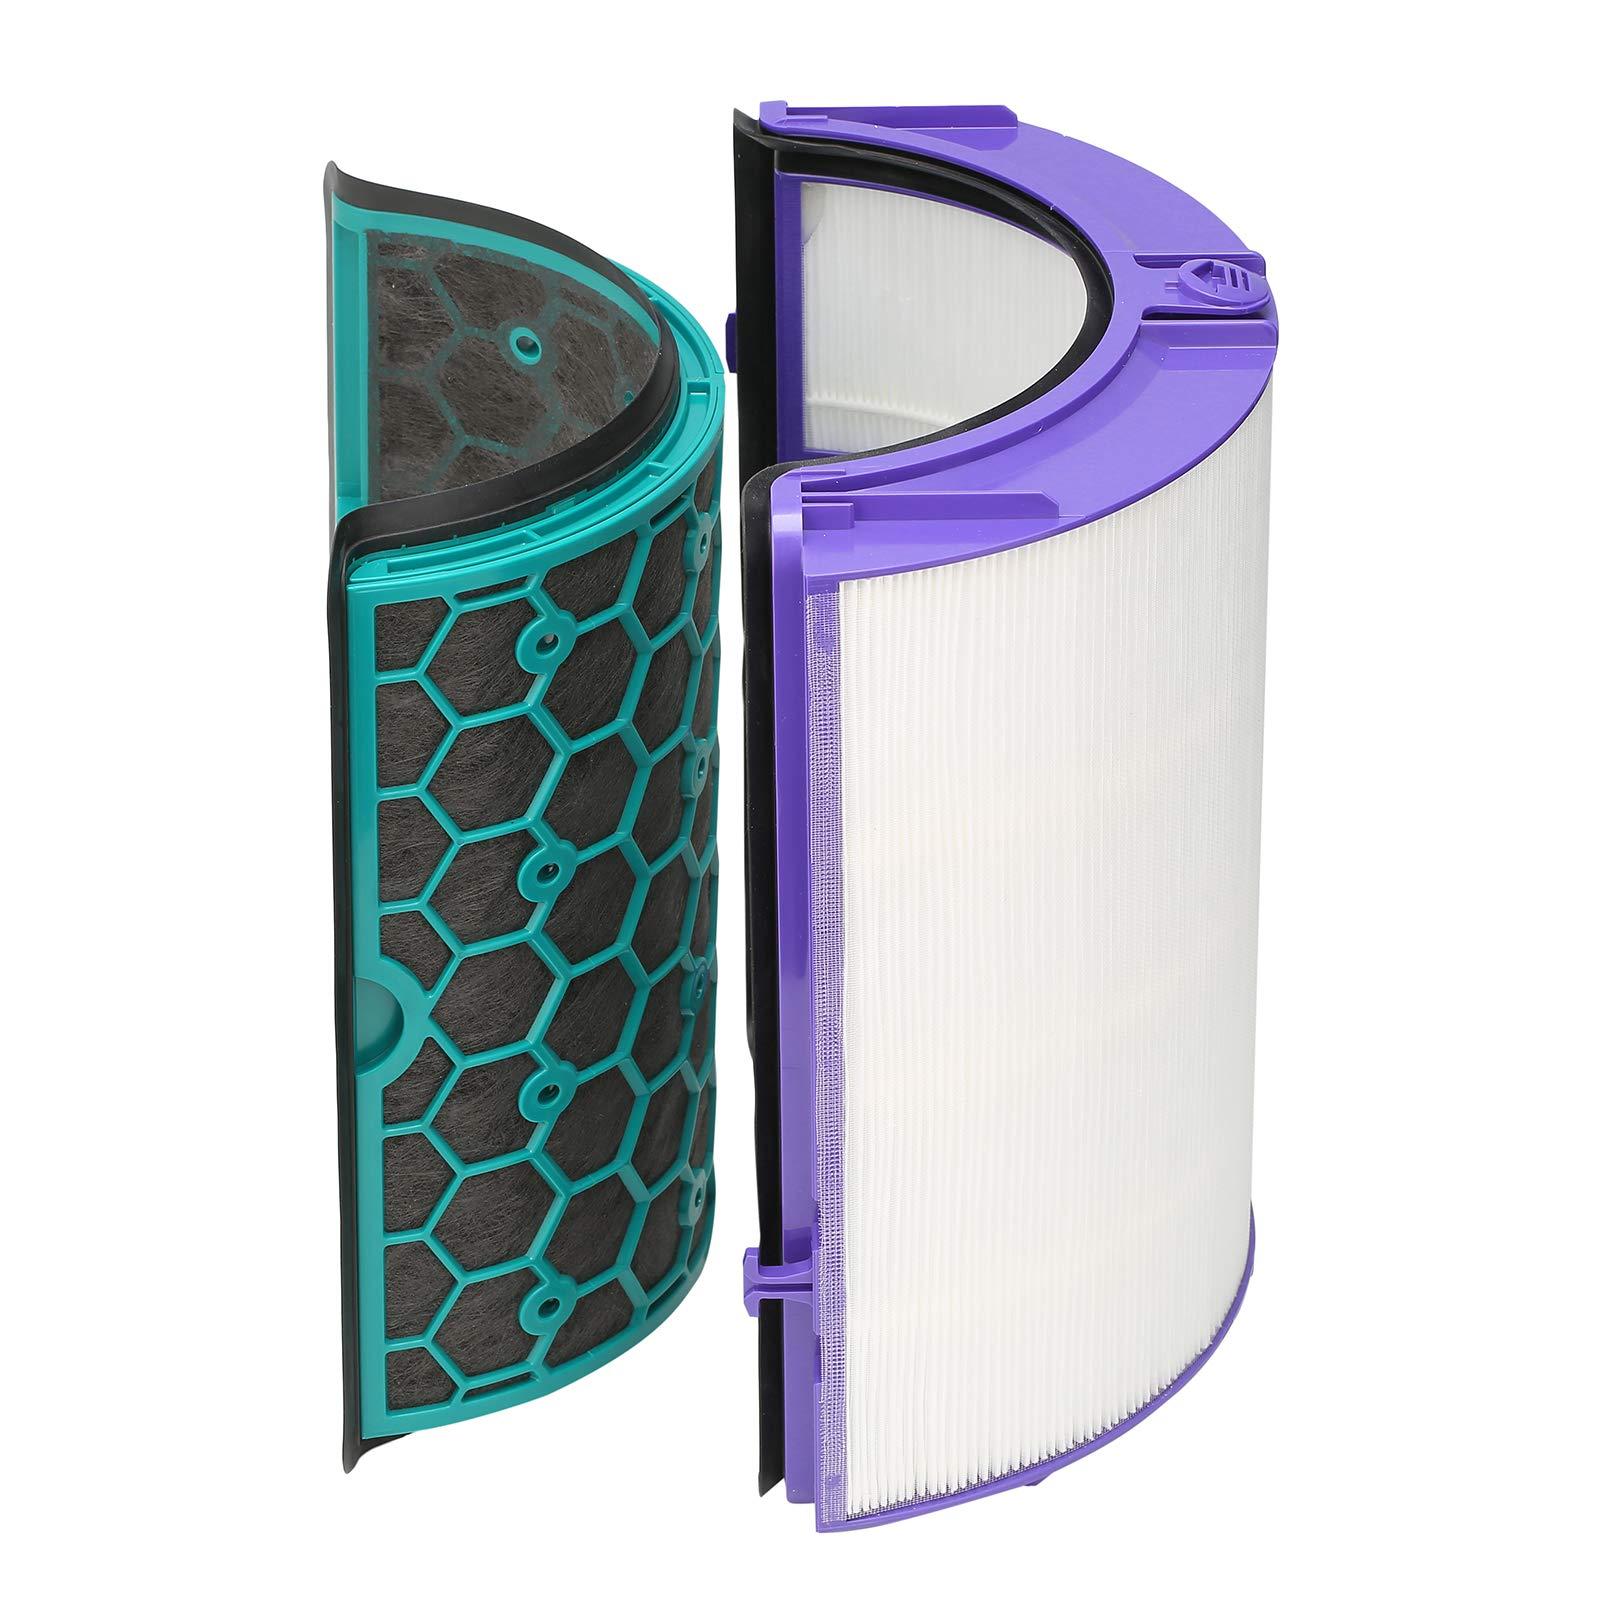 Dyson DP04 HP04 TP04 Pure CoolTM Filtro HEPA de Vidrio purificador ...